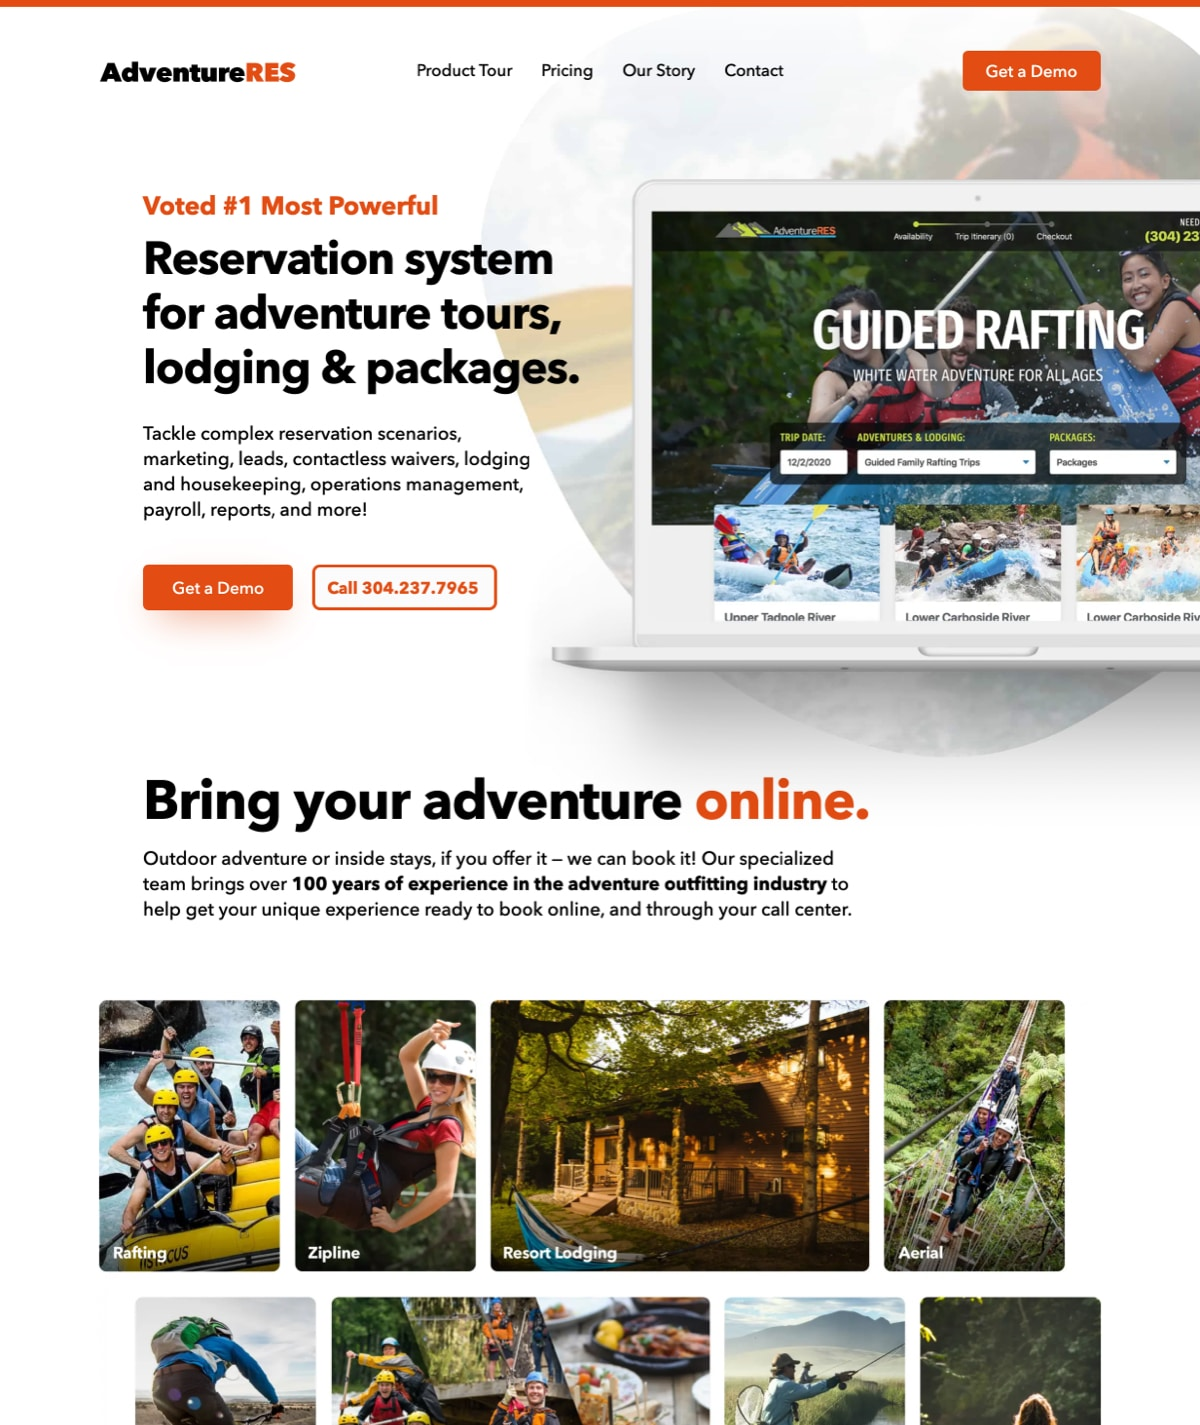 Boise web design - AdventureRES